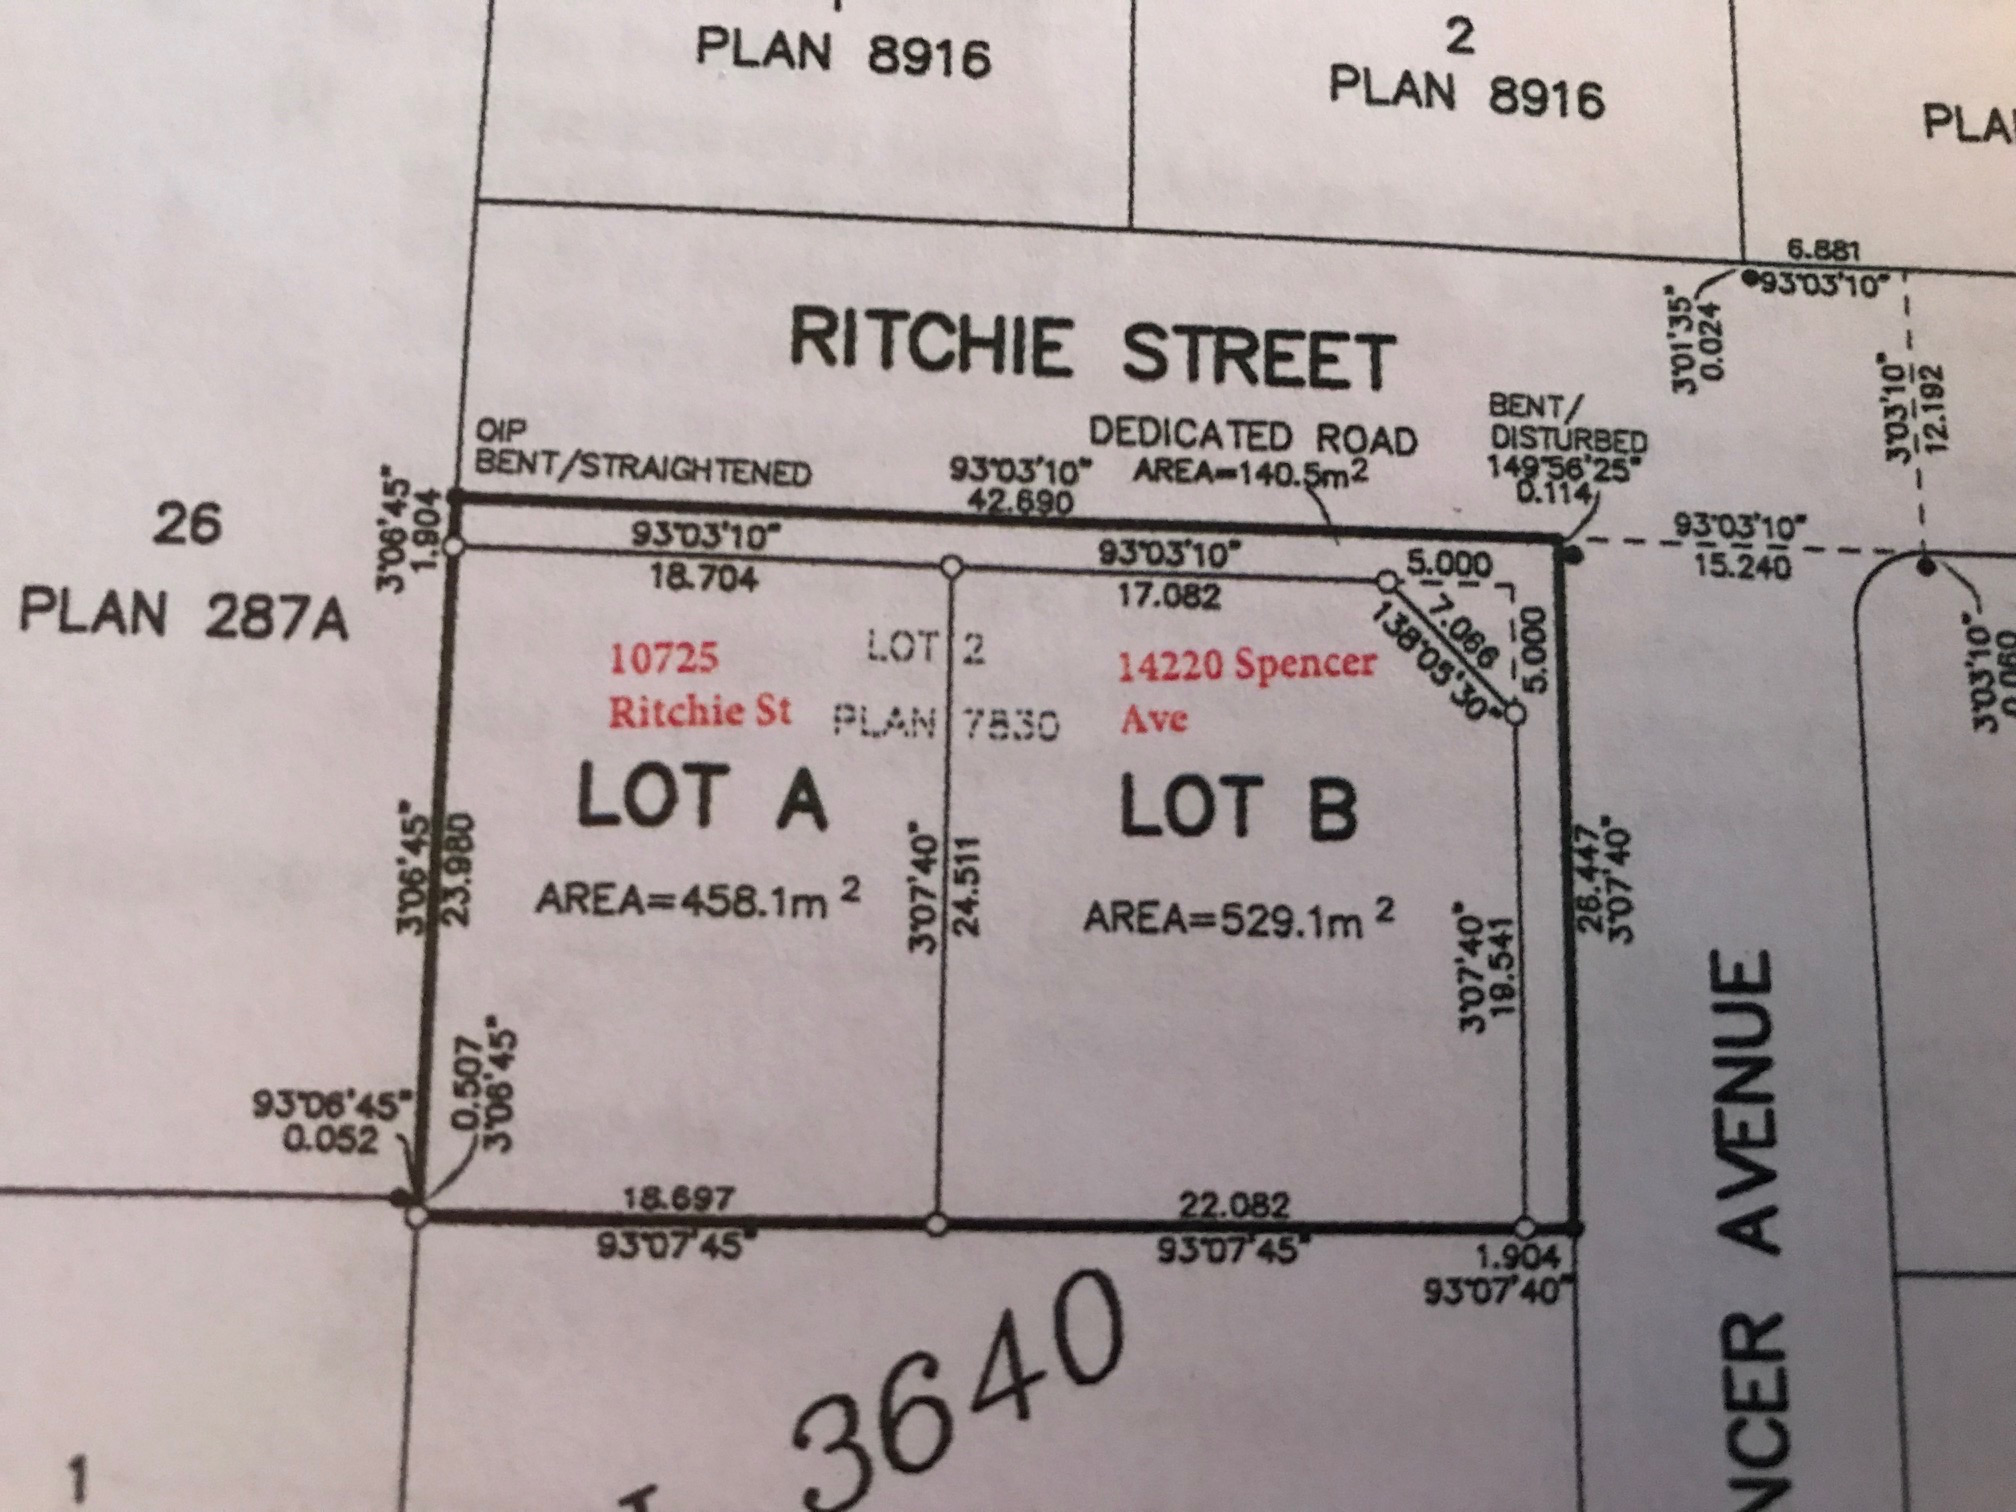 10725 Ritchie Street Plot Plan.jpg